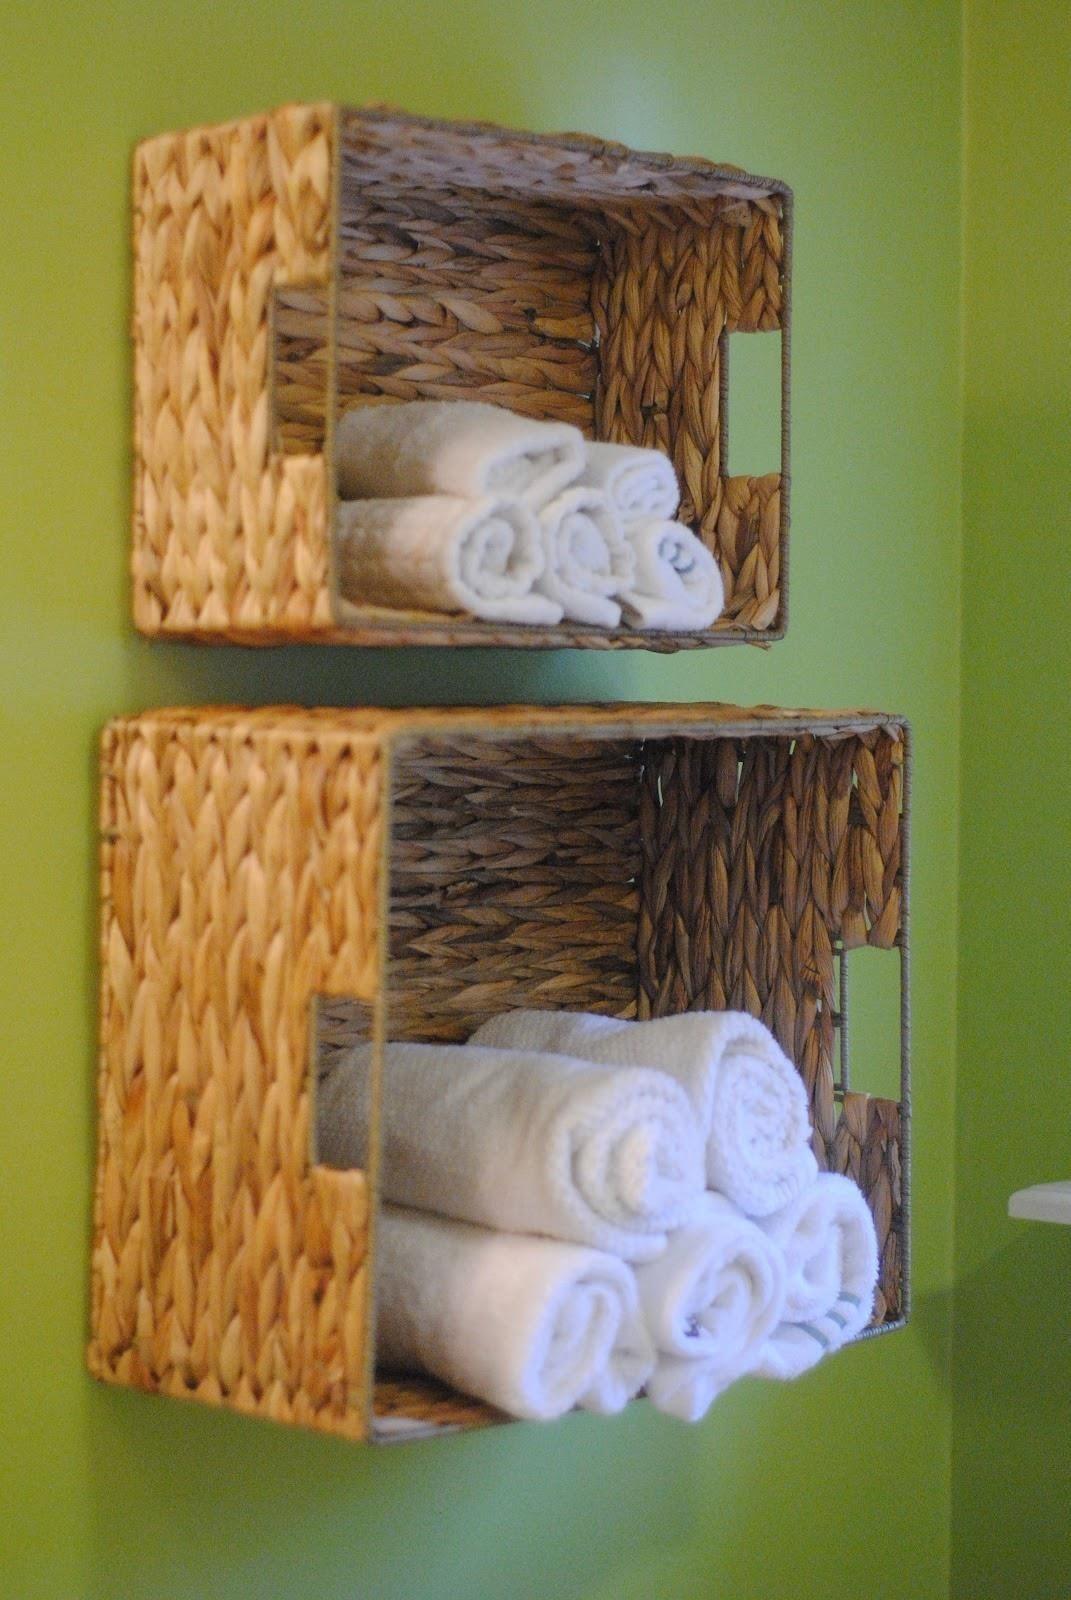 5 Cheap Life Hacks for Organizing Your Bathroom